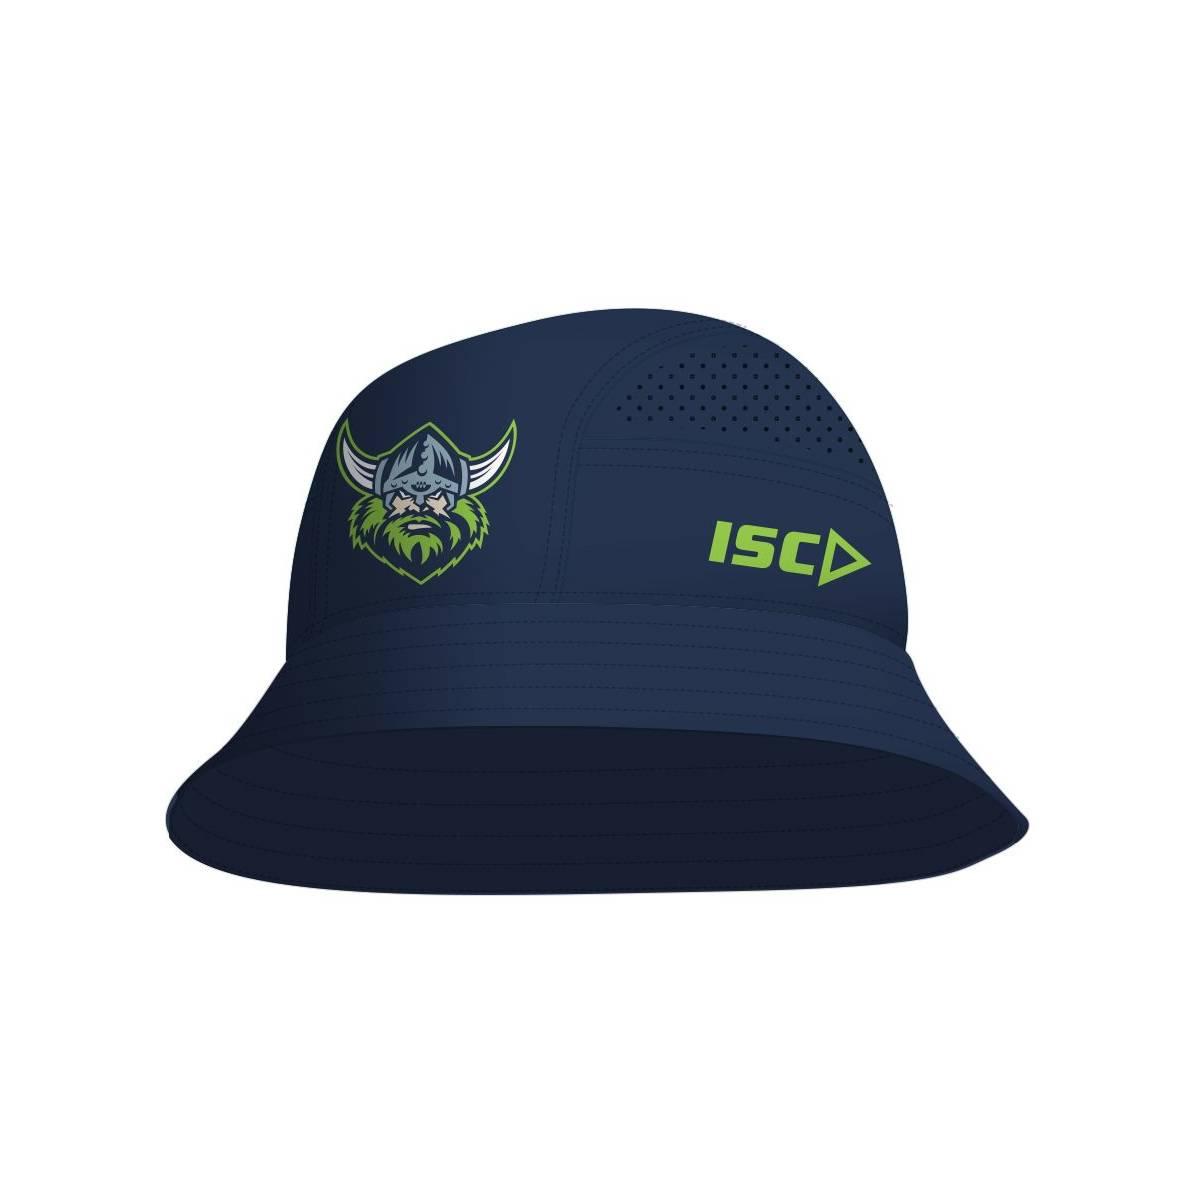 2021 Raiders Bucket Hat1